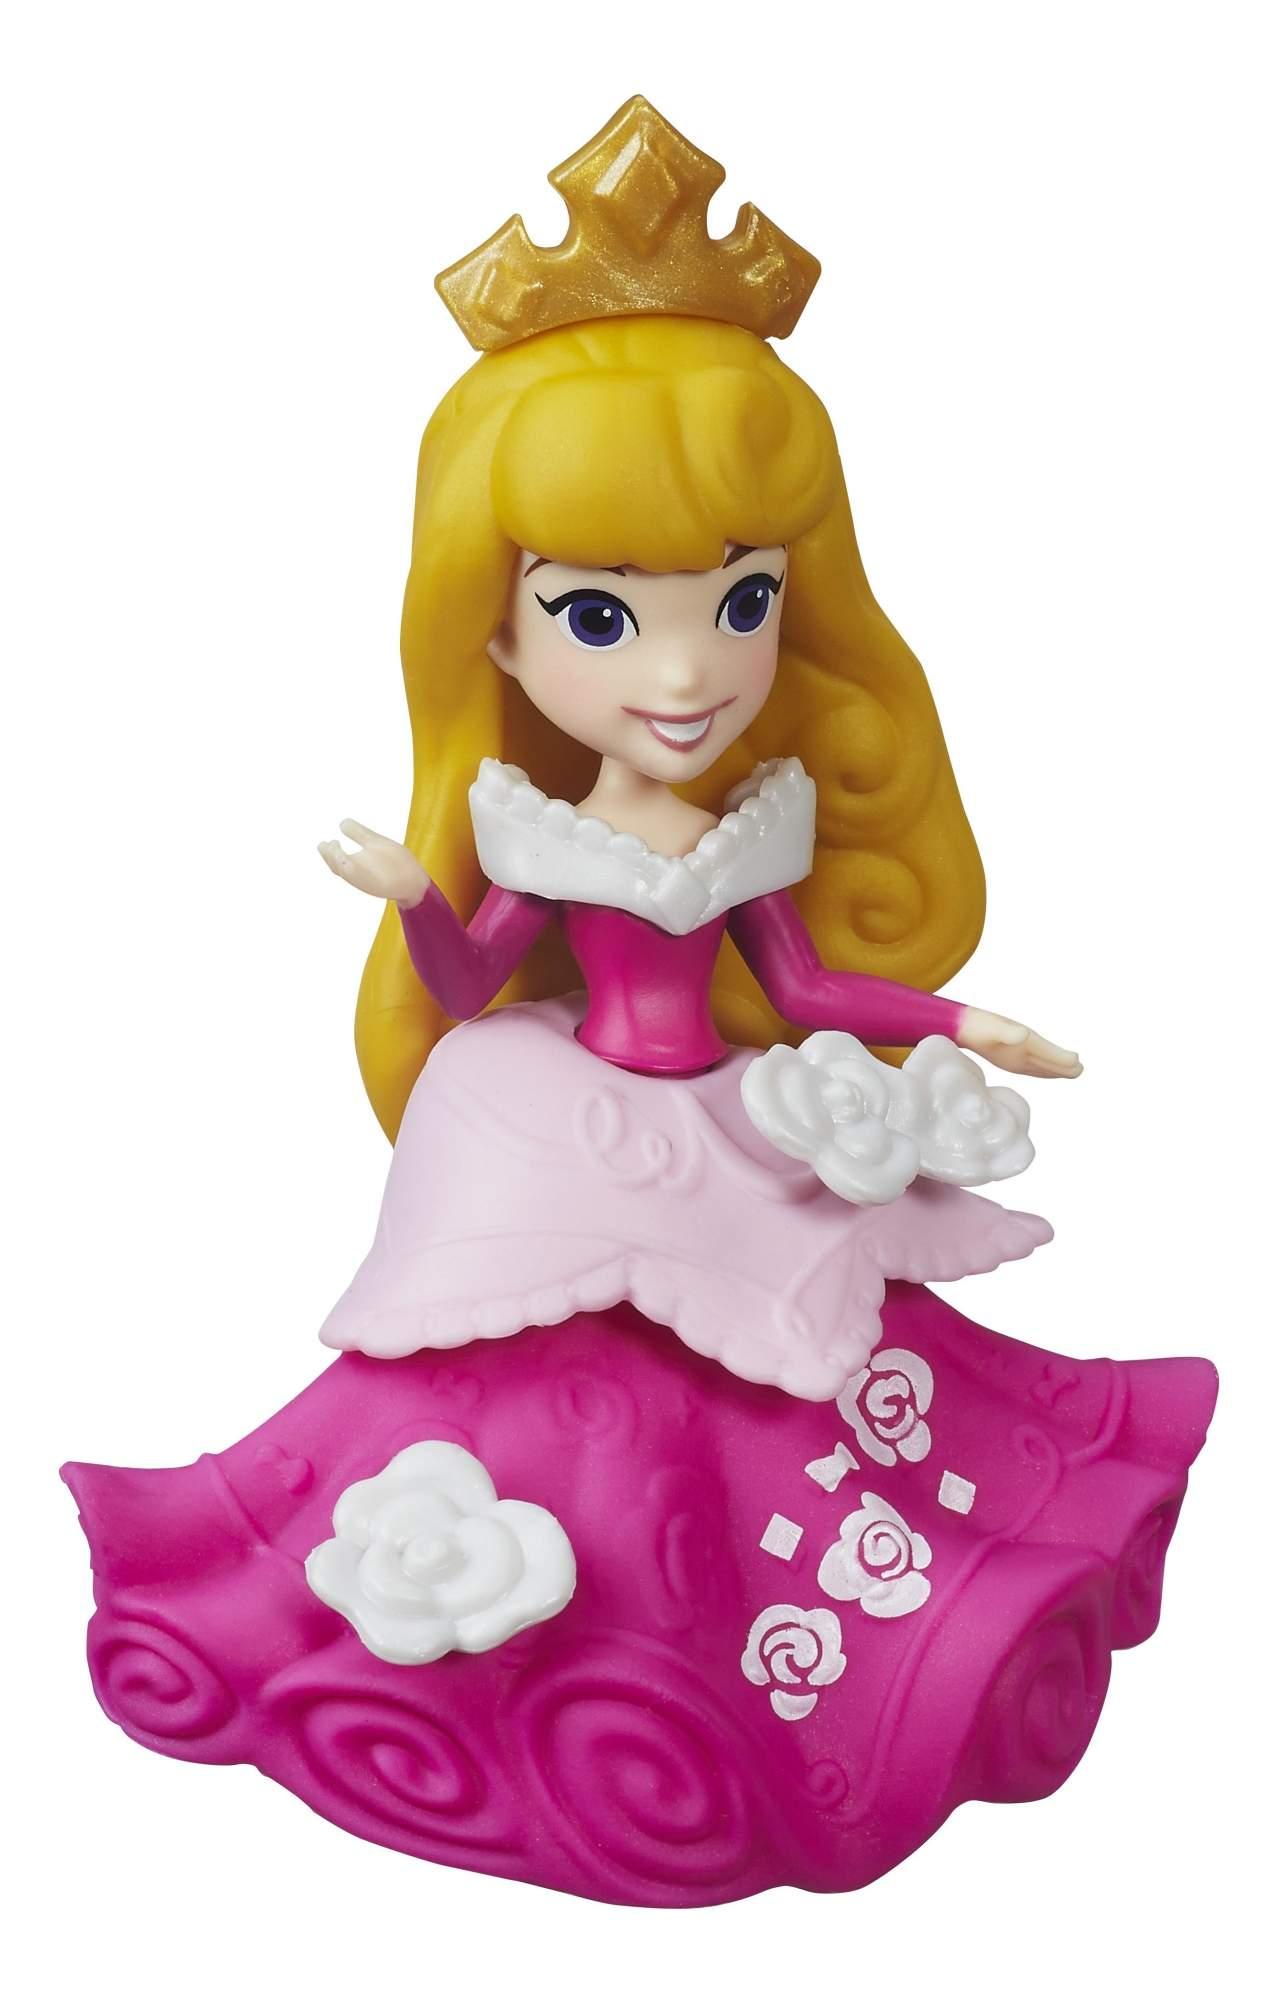 Маленькие куклы принцесс Disney b5321 b5326 7 см